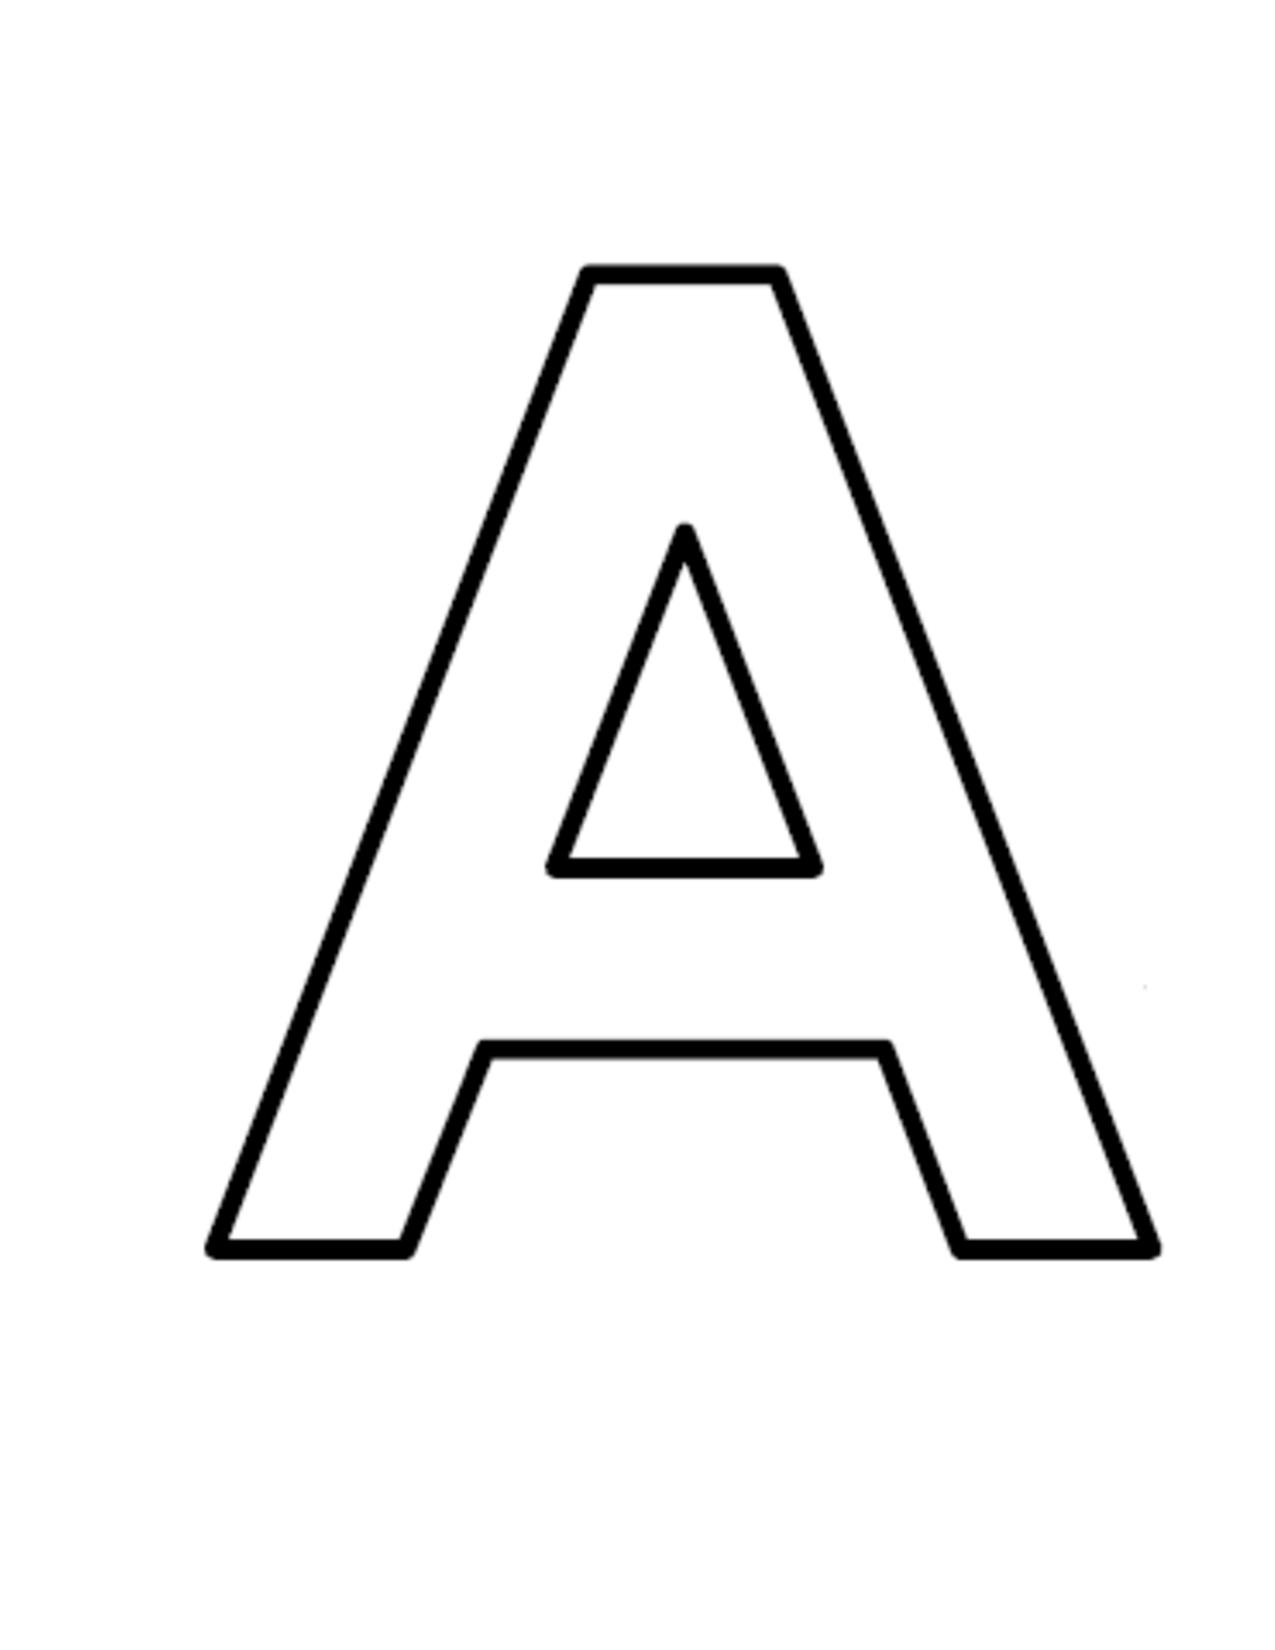 Alphabet a clipart black and white